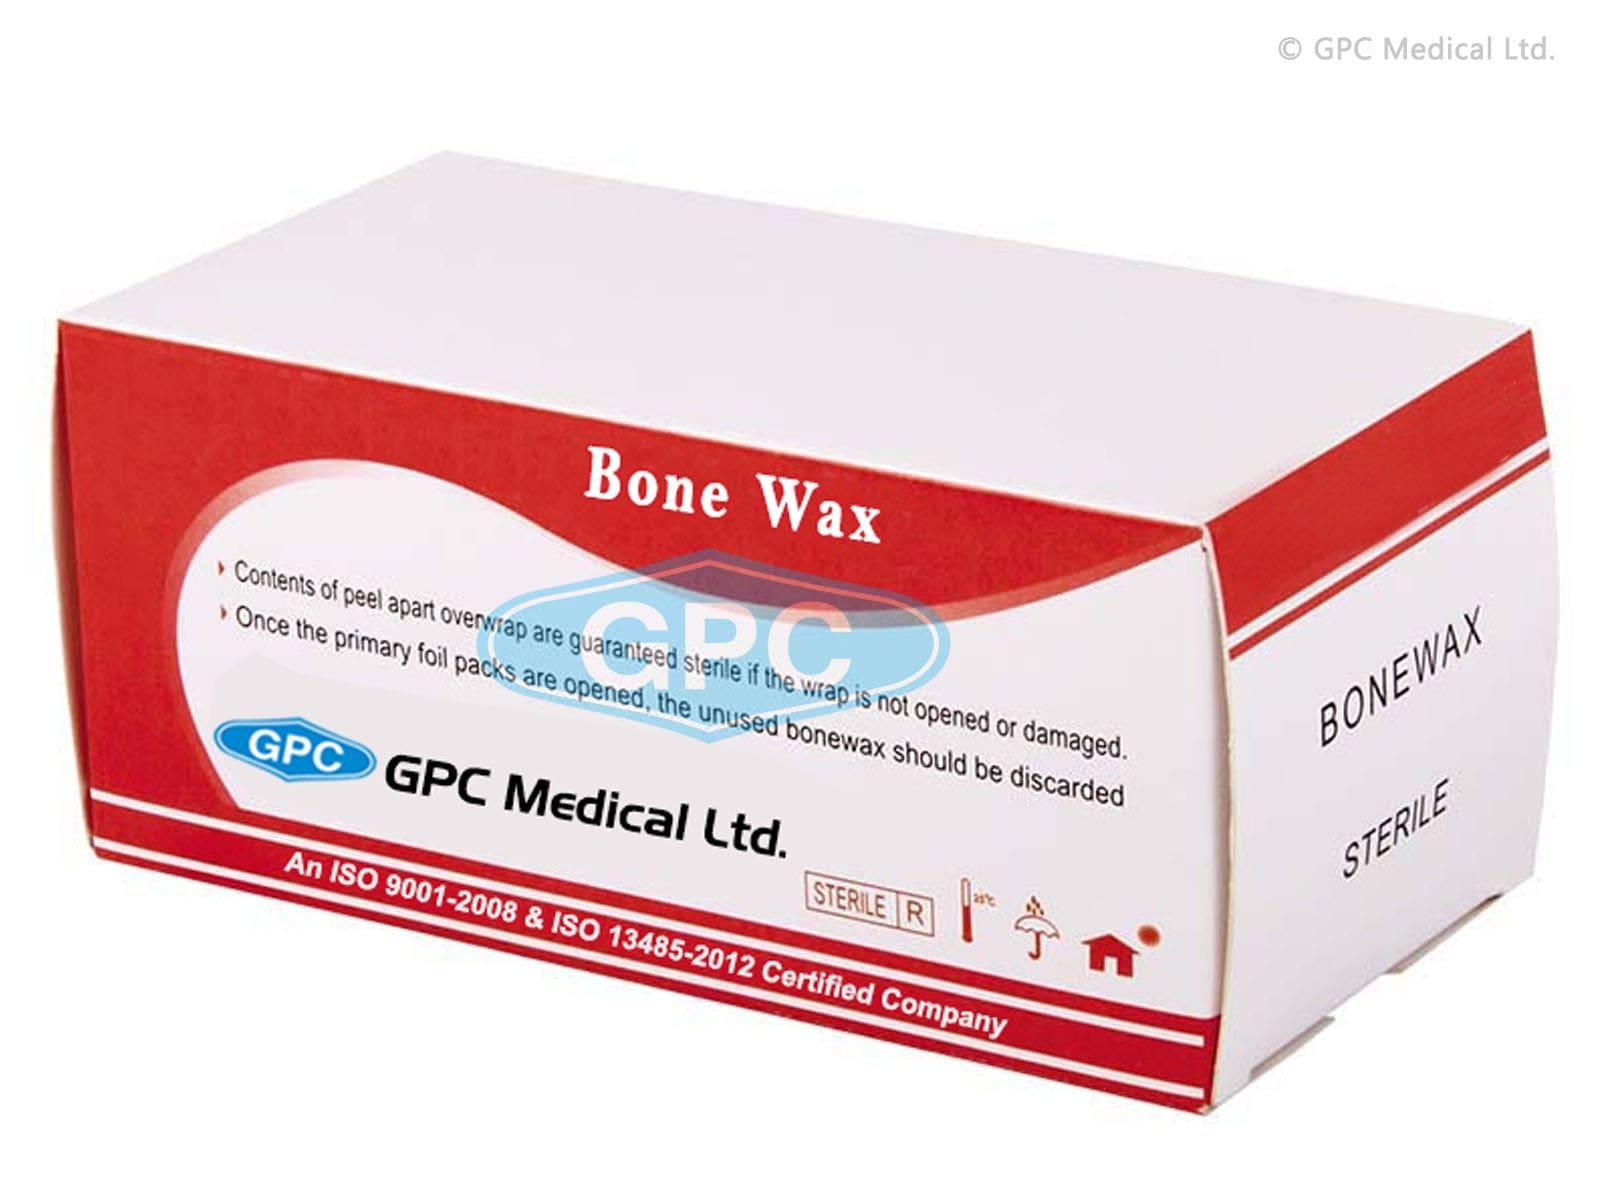 GPCBW - Bone Wax